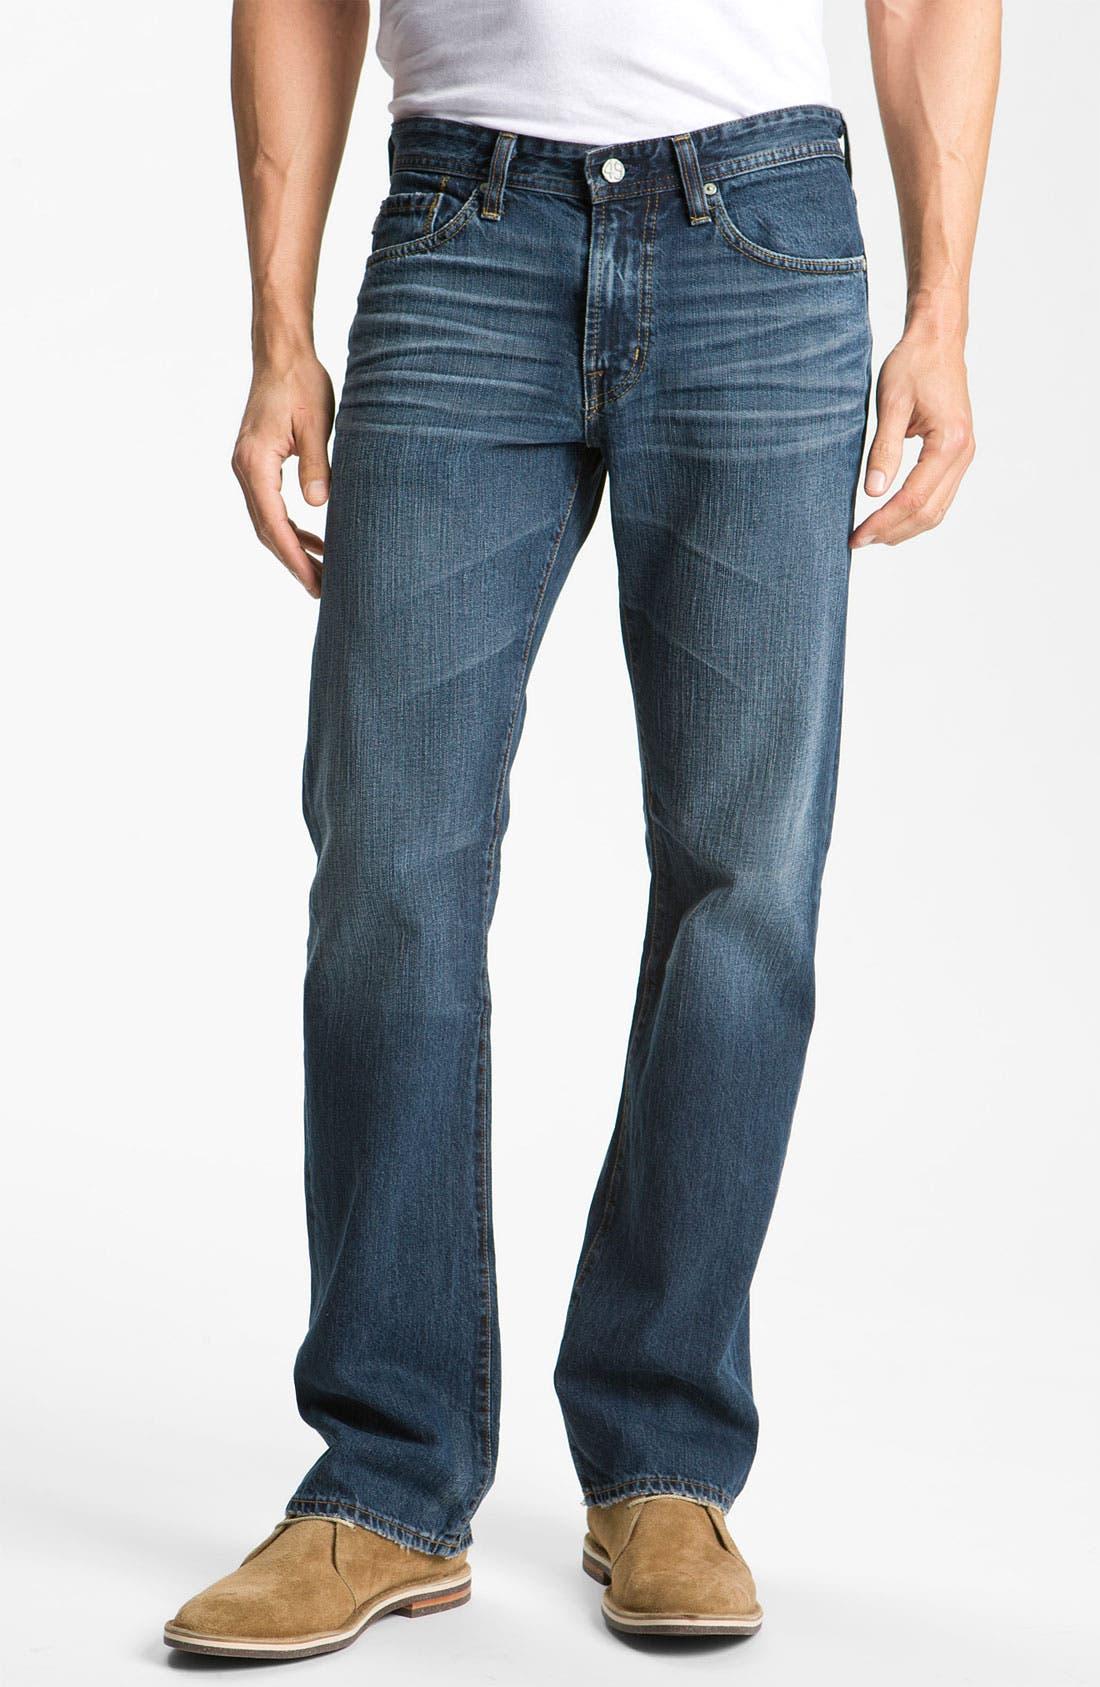 Alternate Image 1 Selected - AG Jeans 'Protégé' Straight Leg Jeans (5 Year Overdyed)